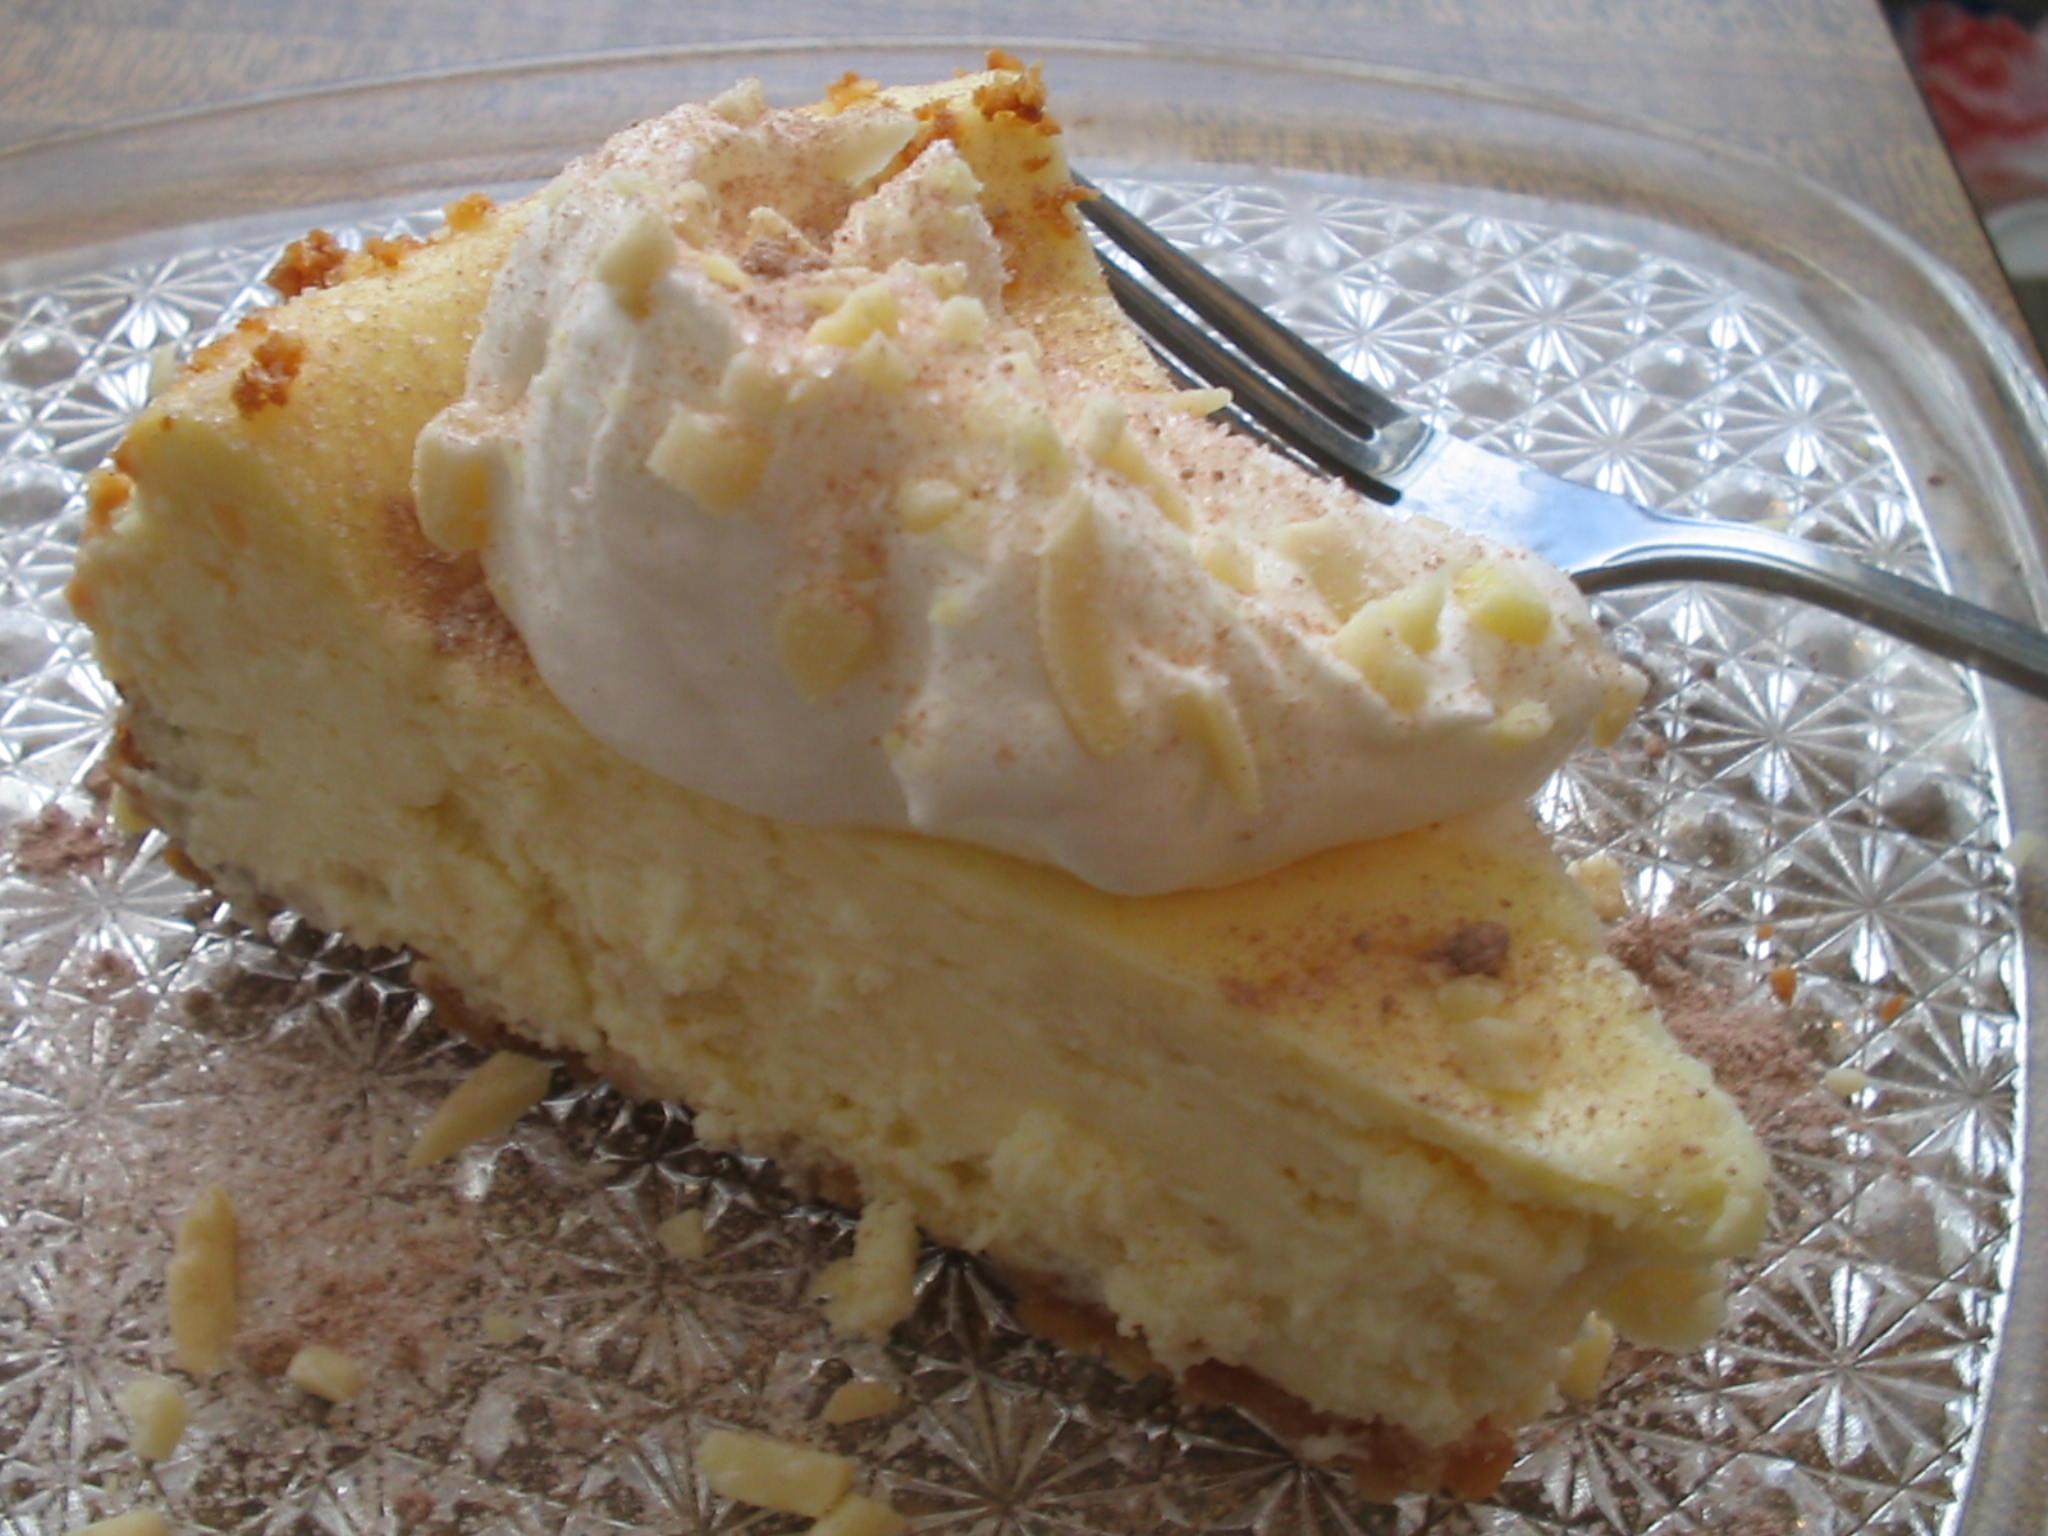 blueberyy cheesecake recipe